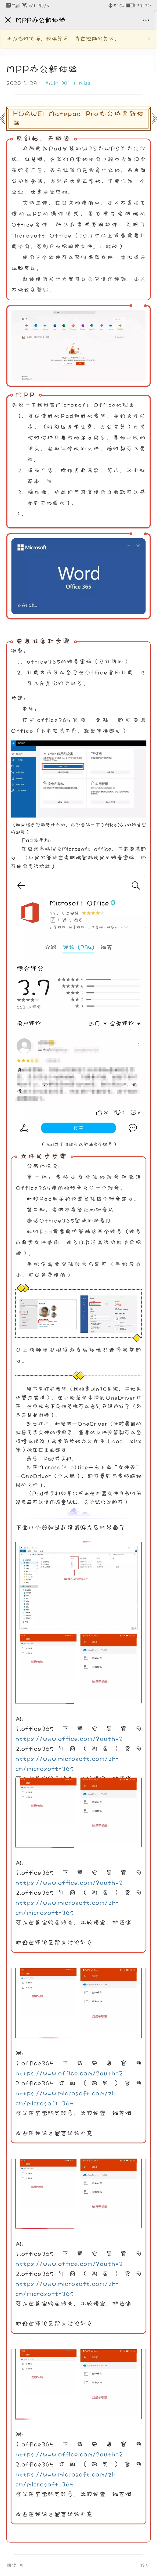 Screenshot_20200429_111029_com.tencent.mm.jpg